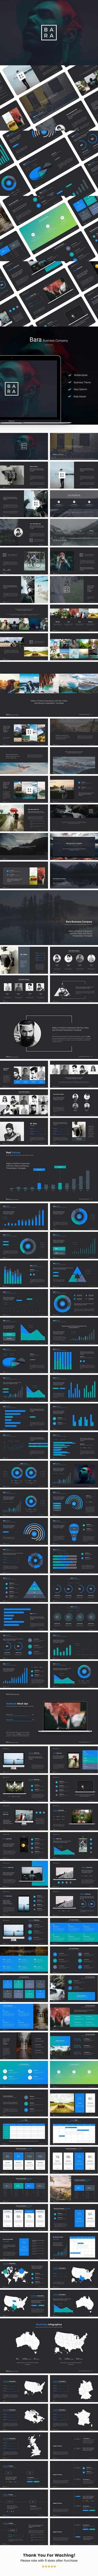 Bara Business Company Theme. Infographic Templates. $18.00